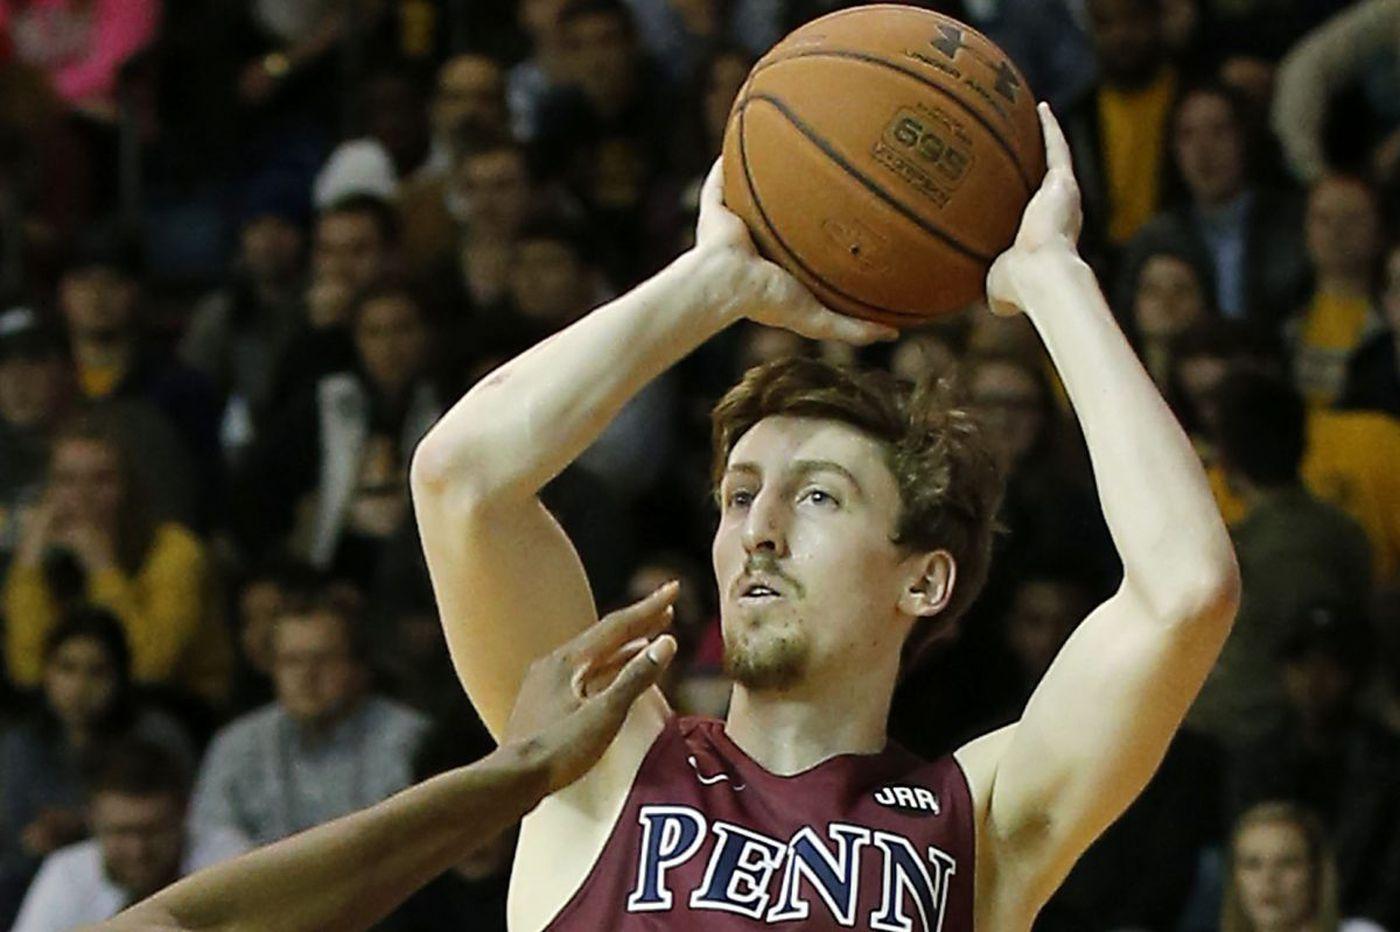 Penn beats Howard behind Caleb Wood's shooting, Ryan Betley's double-double